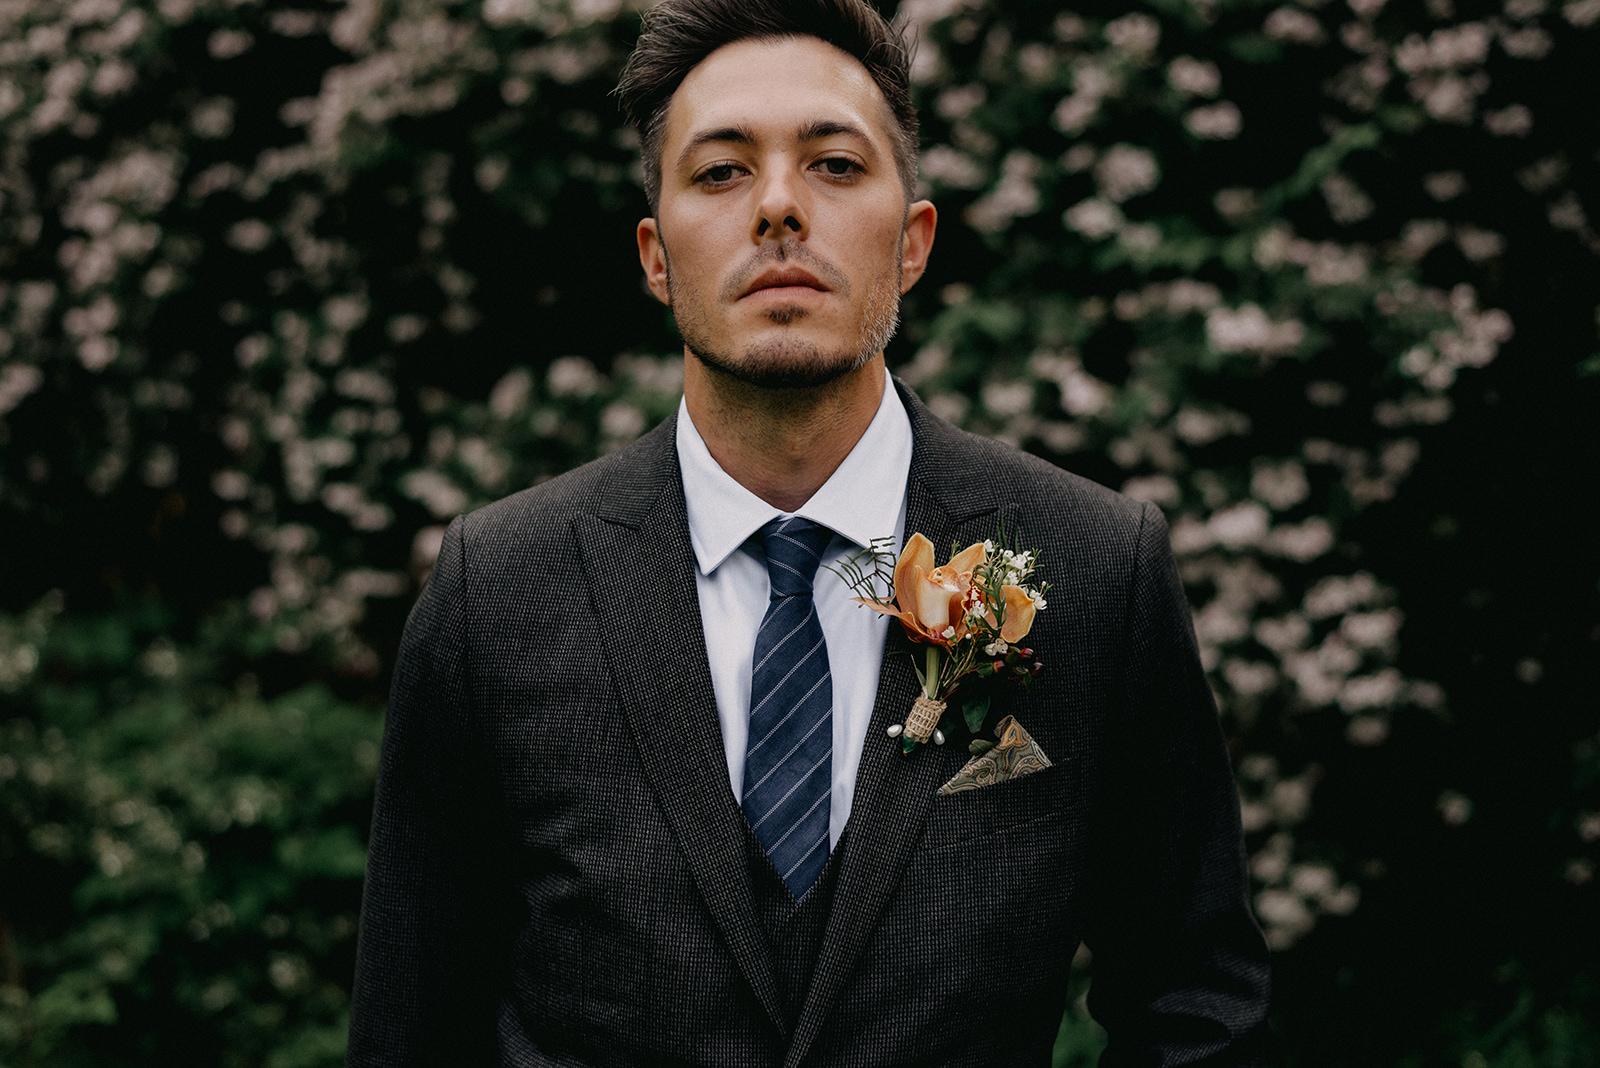 Groom photo - Pearl Weddings & Events